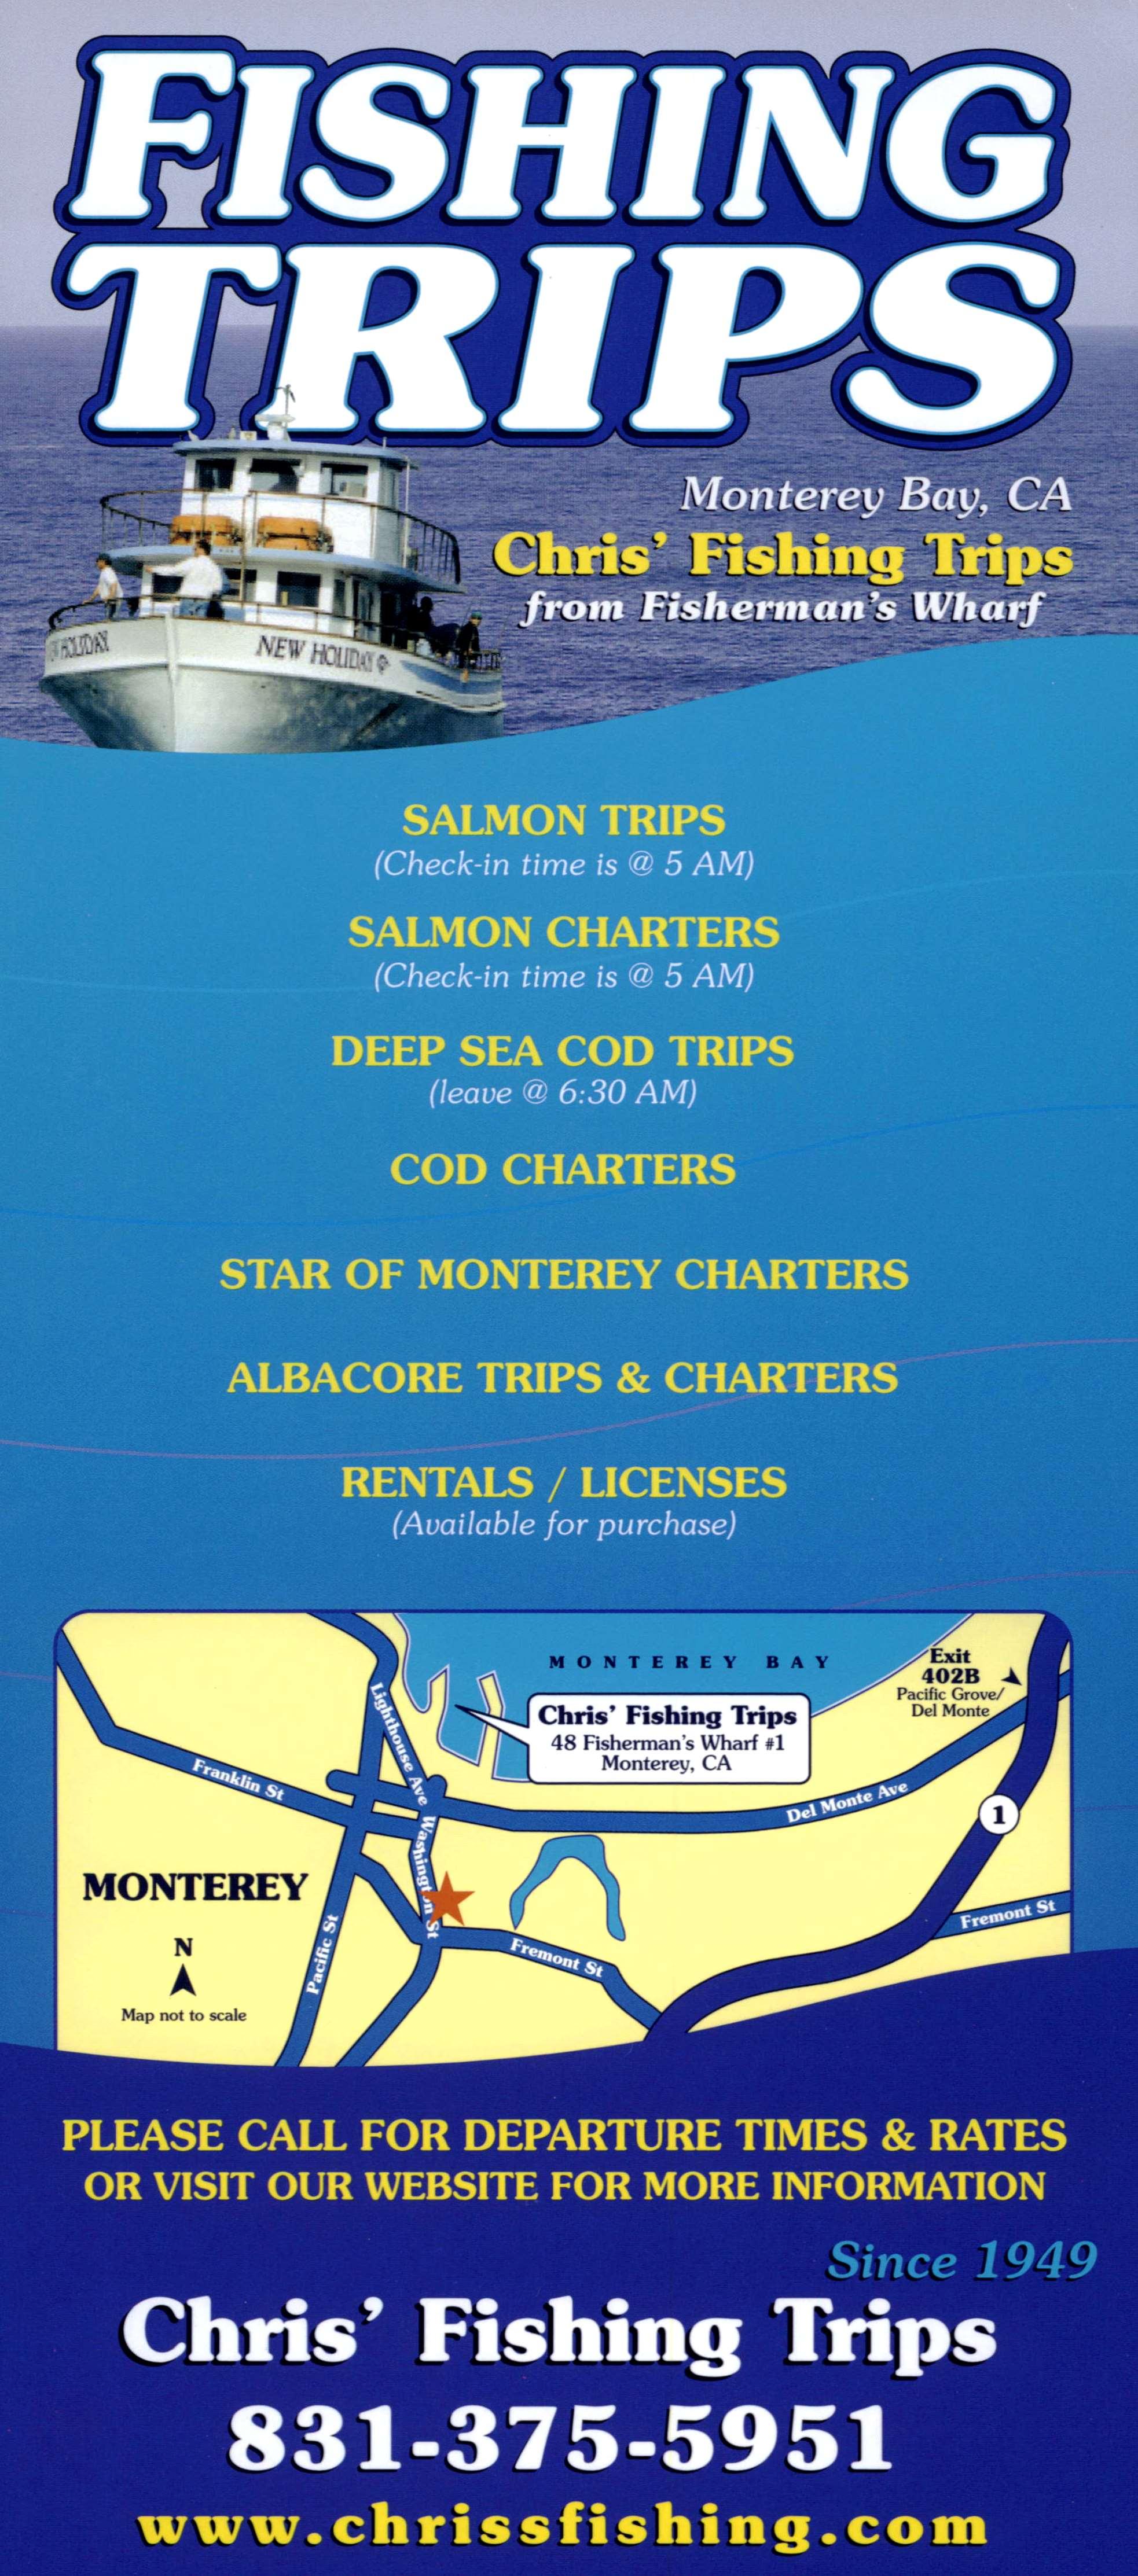 Chris' Fishing Trips brochure thumbnail